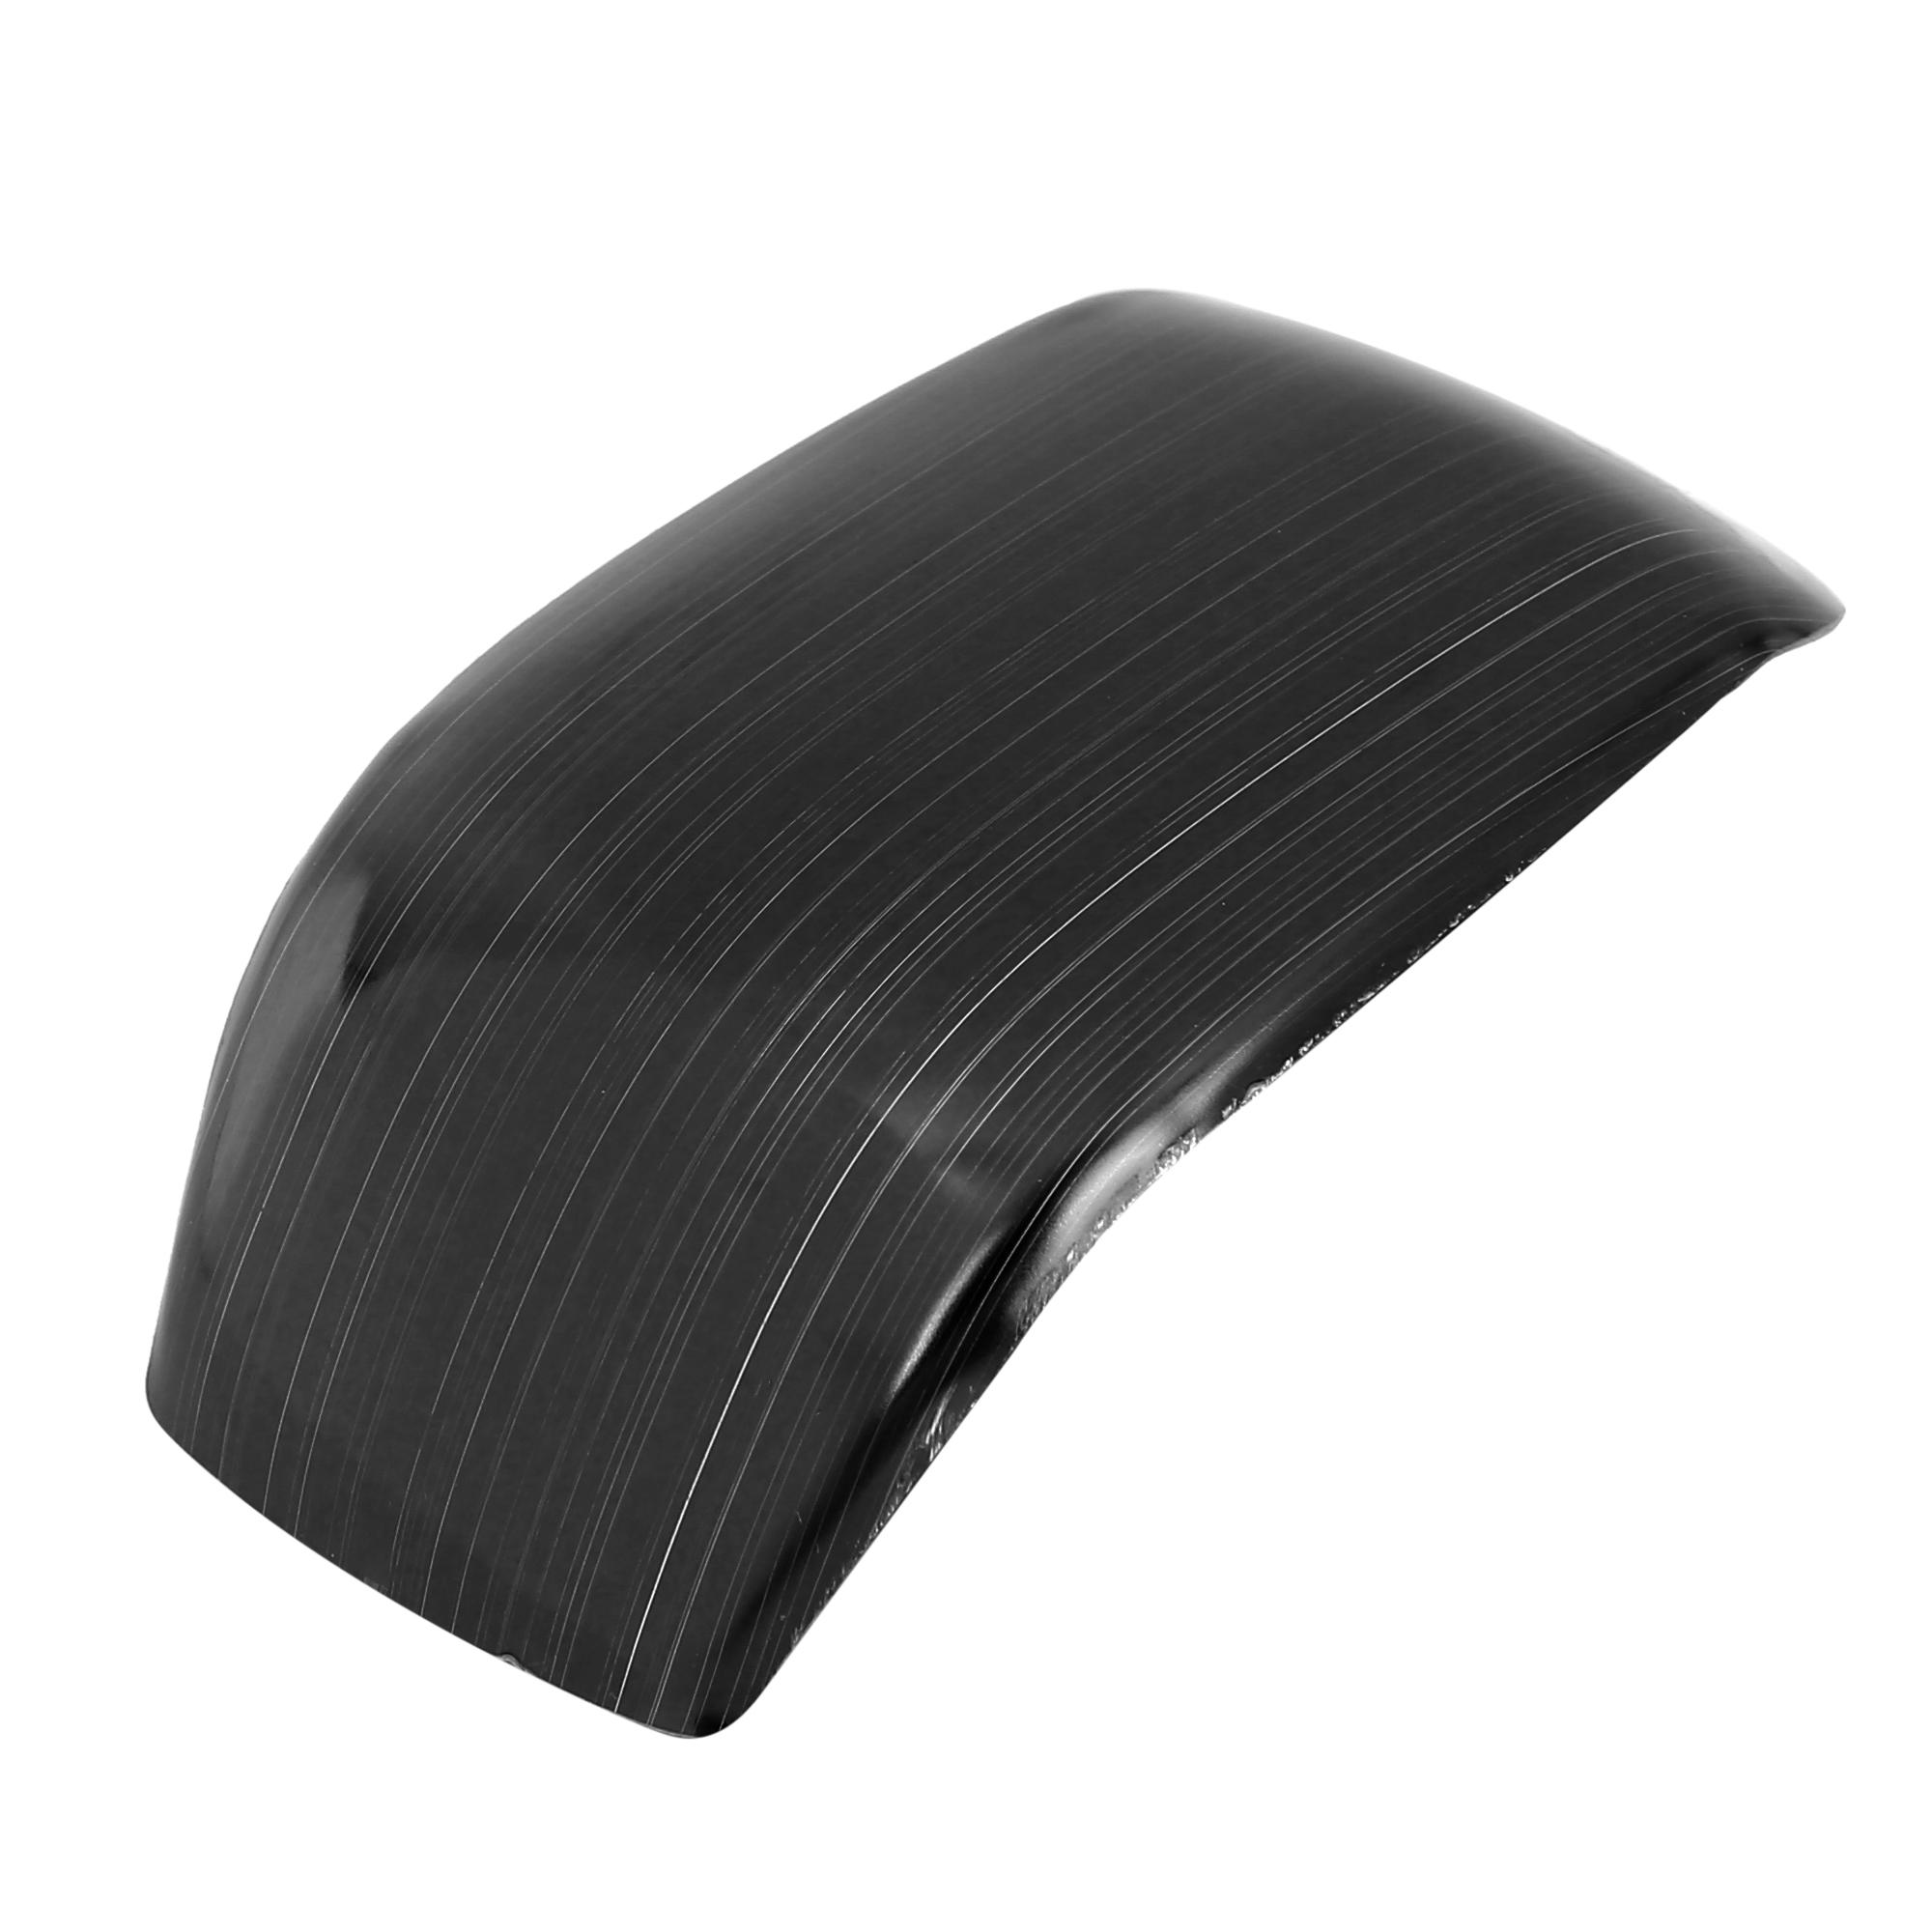 Car Gear Shift Knob Panel Cover Sticker Bright Black for Toyota RAV4 2019-2020